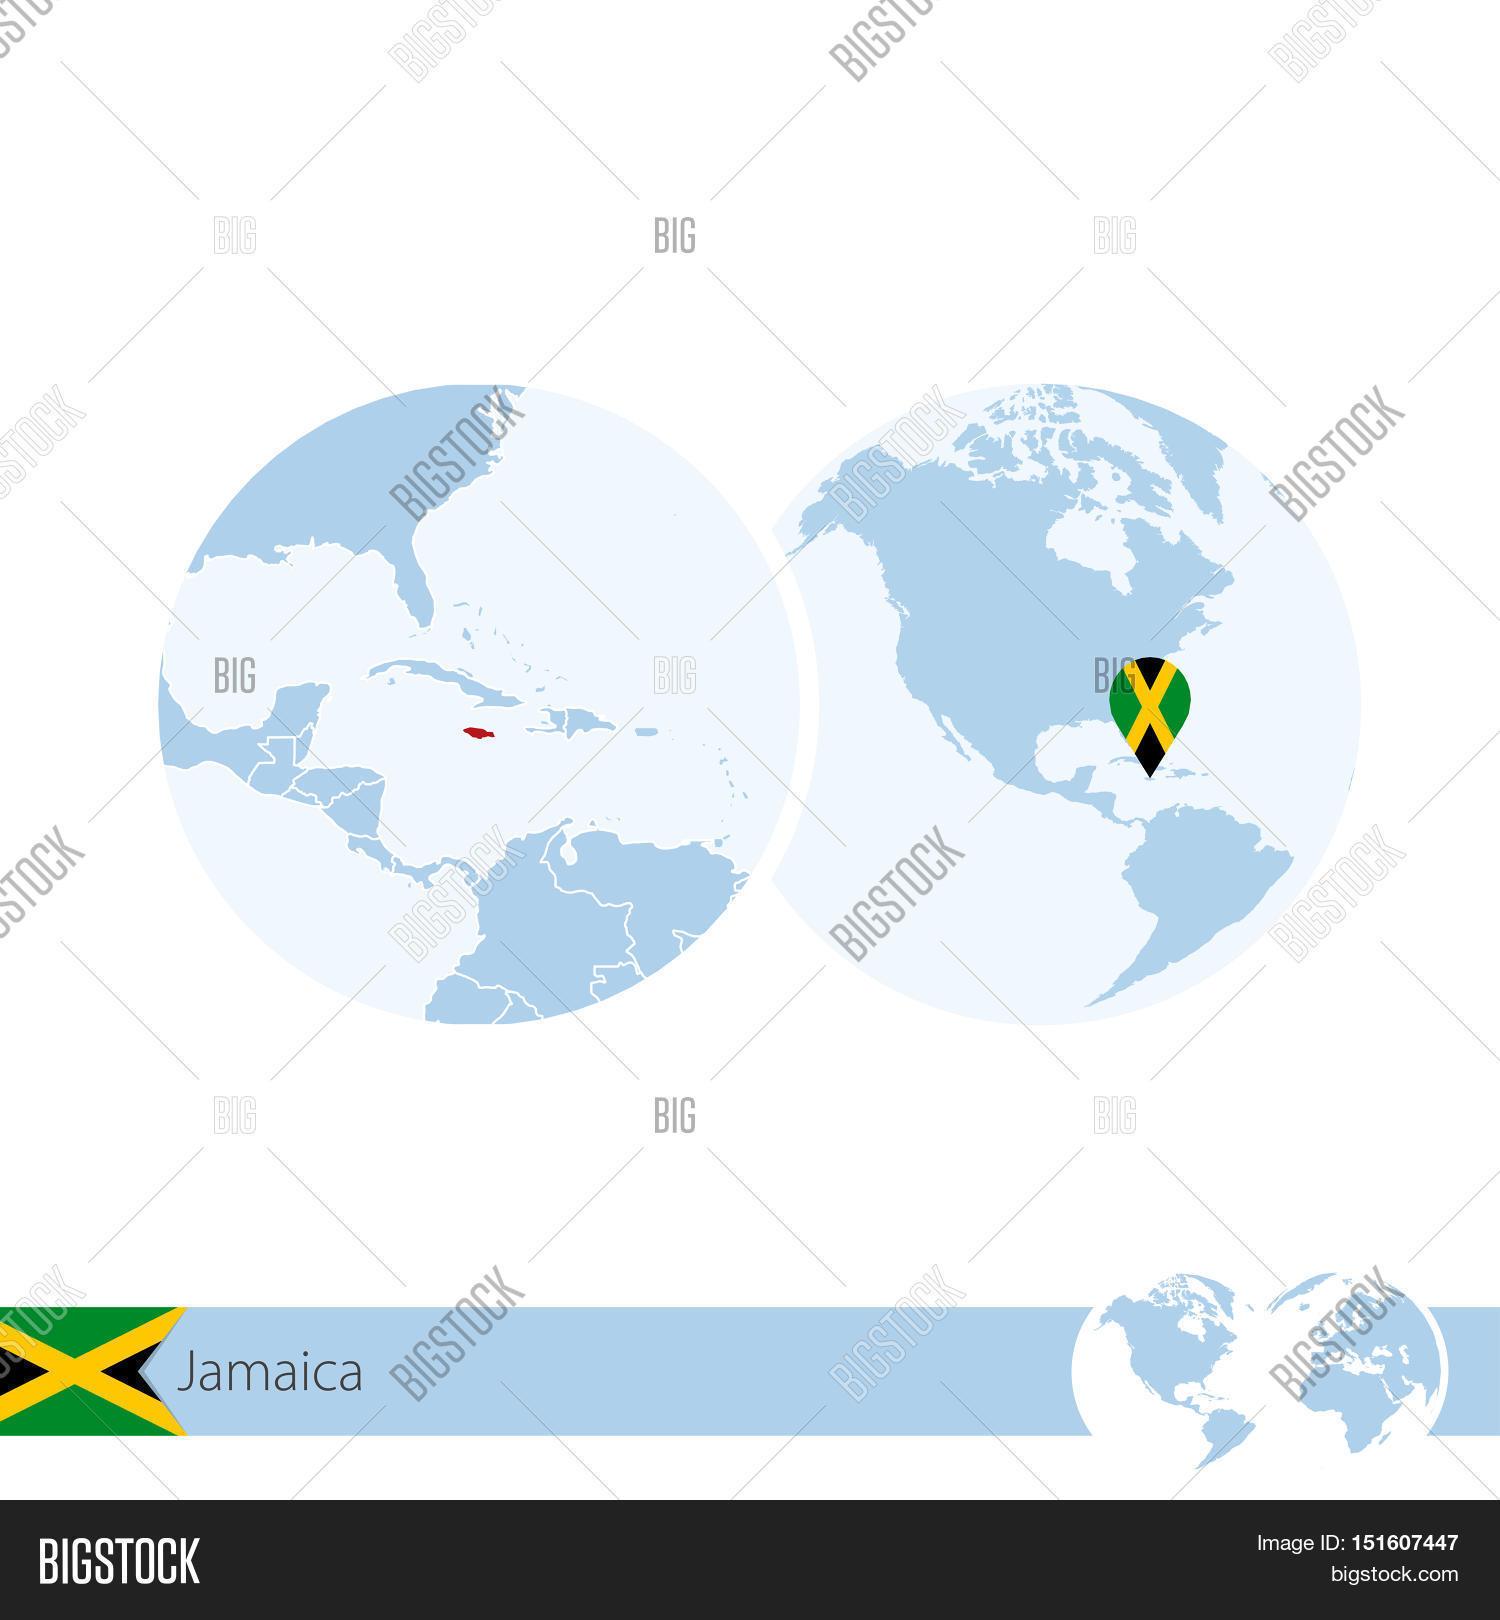 Jamaica On World Vector & Photo (Free Trial) | Bigstock